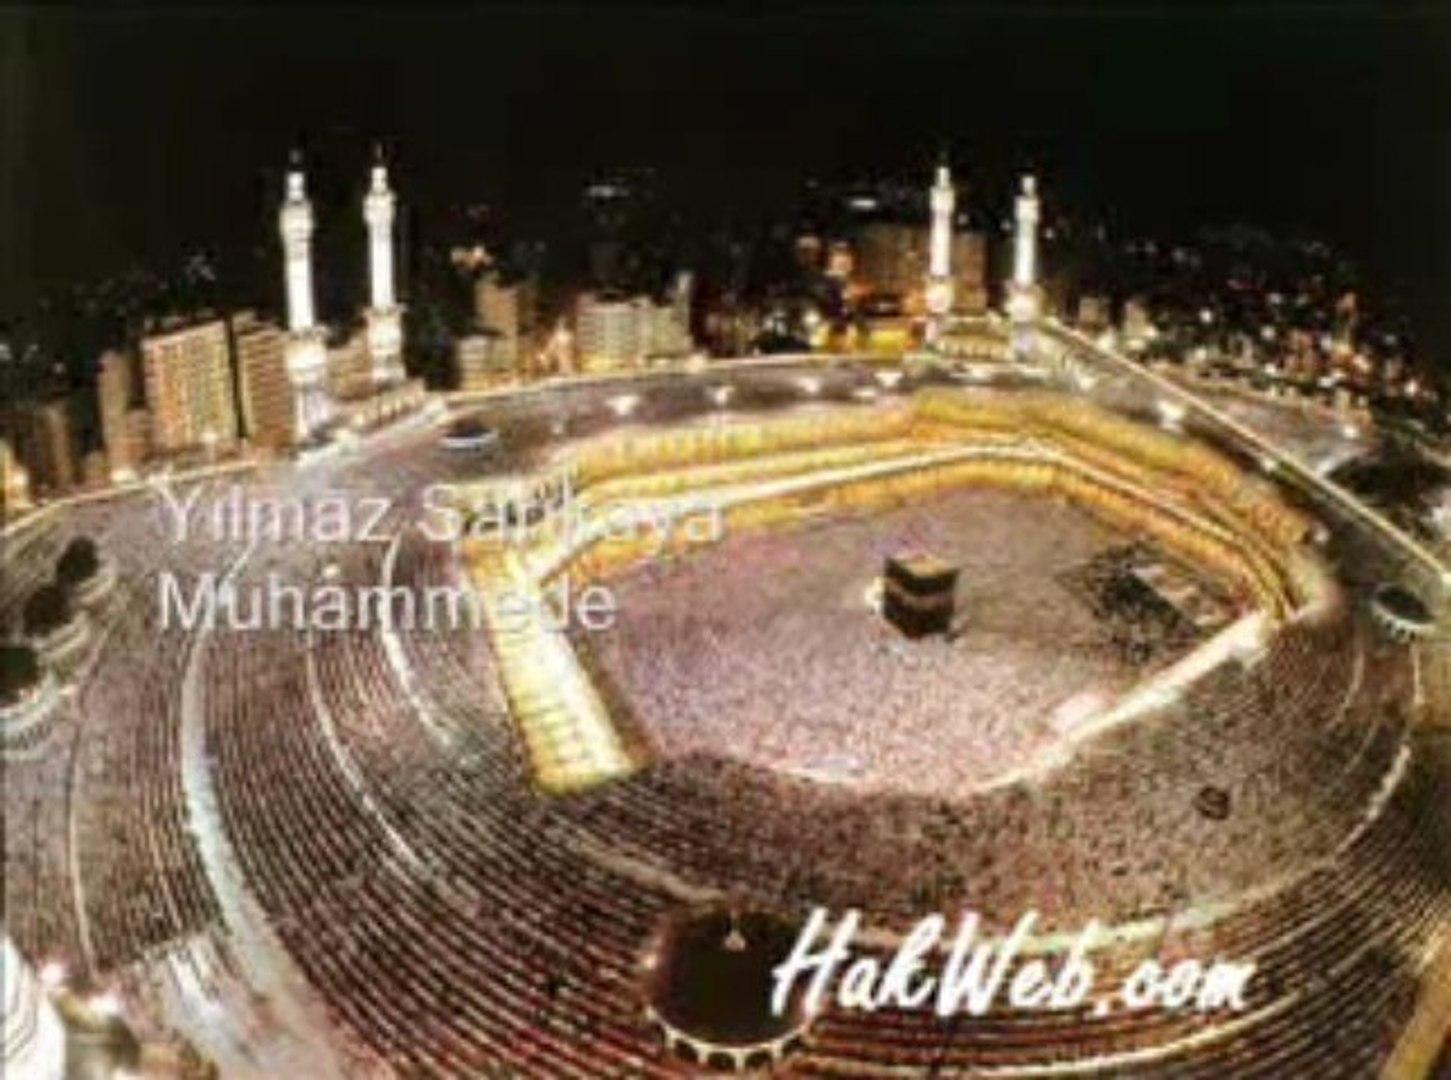 ParisSesli,ParisSesli,Yılmaz Sarıkaya-Muhammede